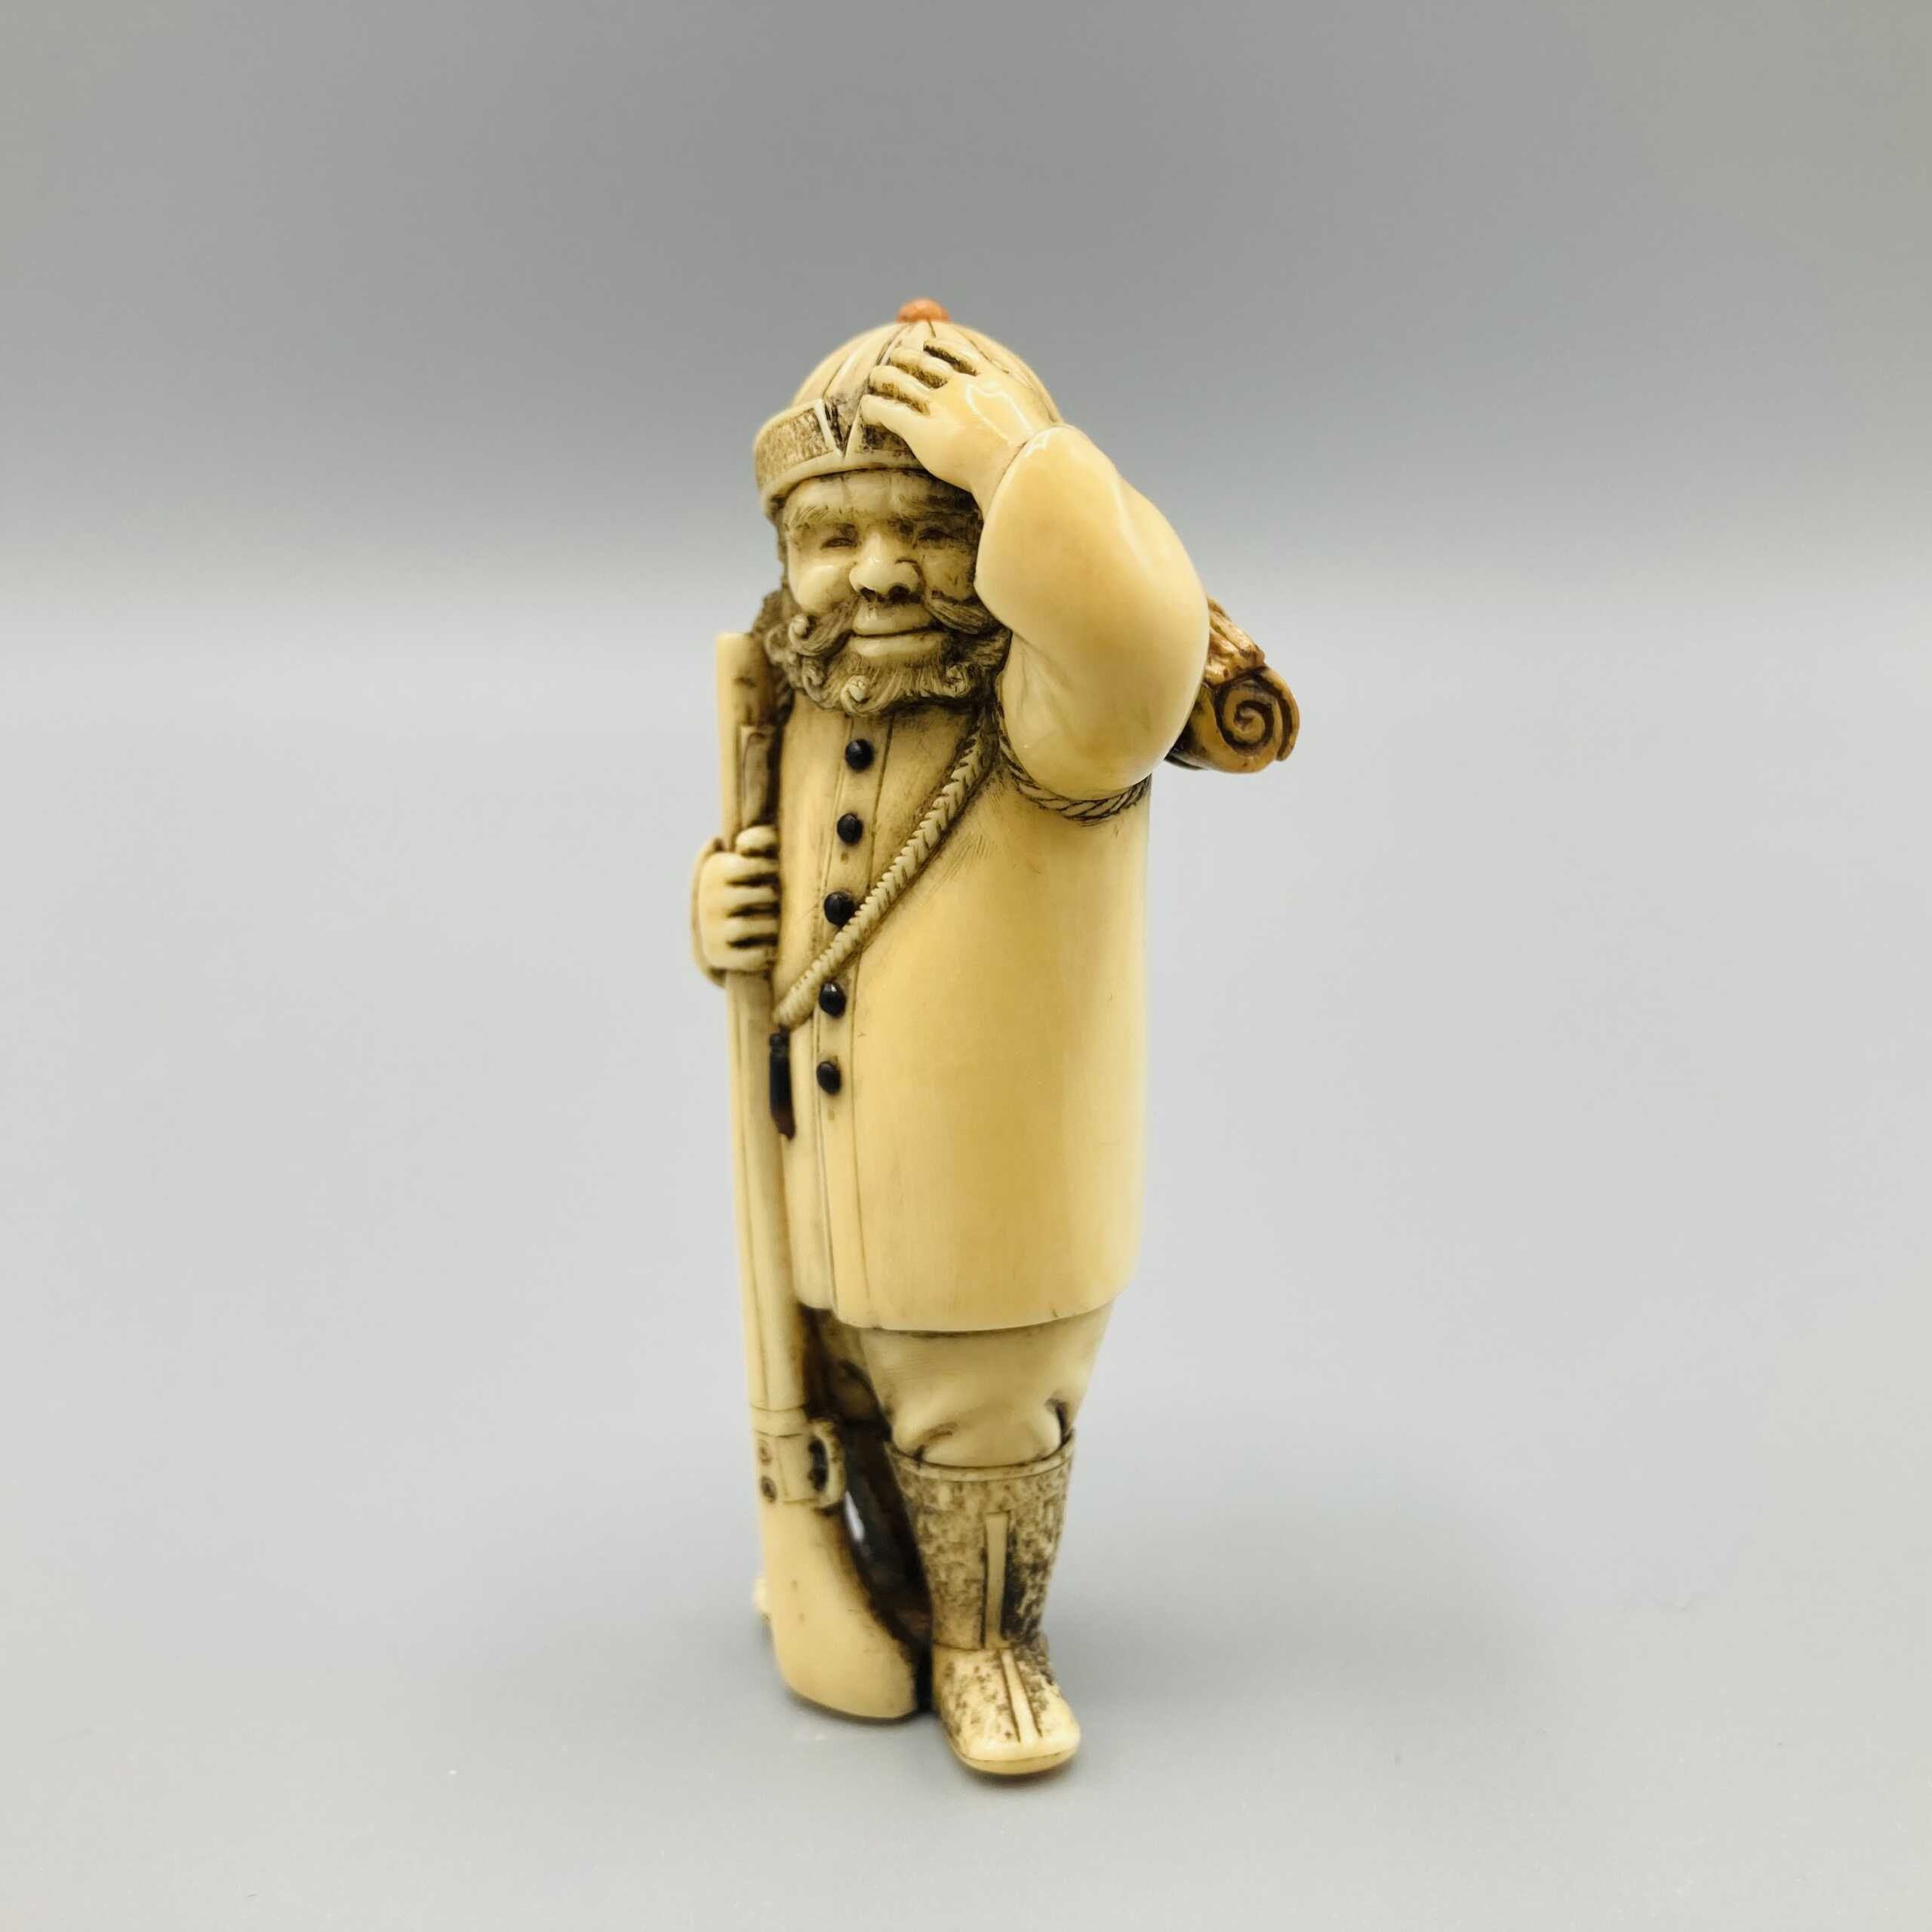 Chokusai ivory netsuke of FM Pinto 4